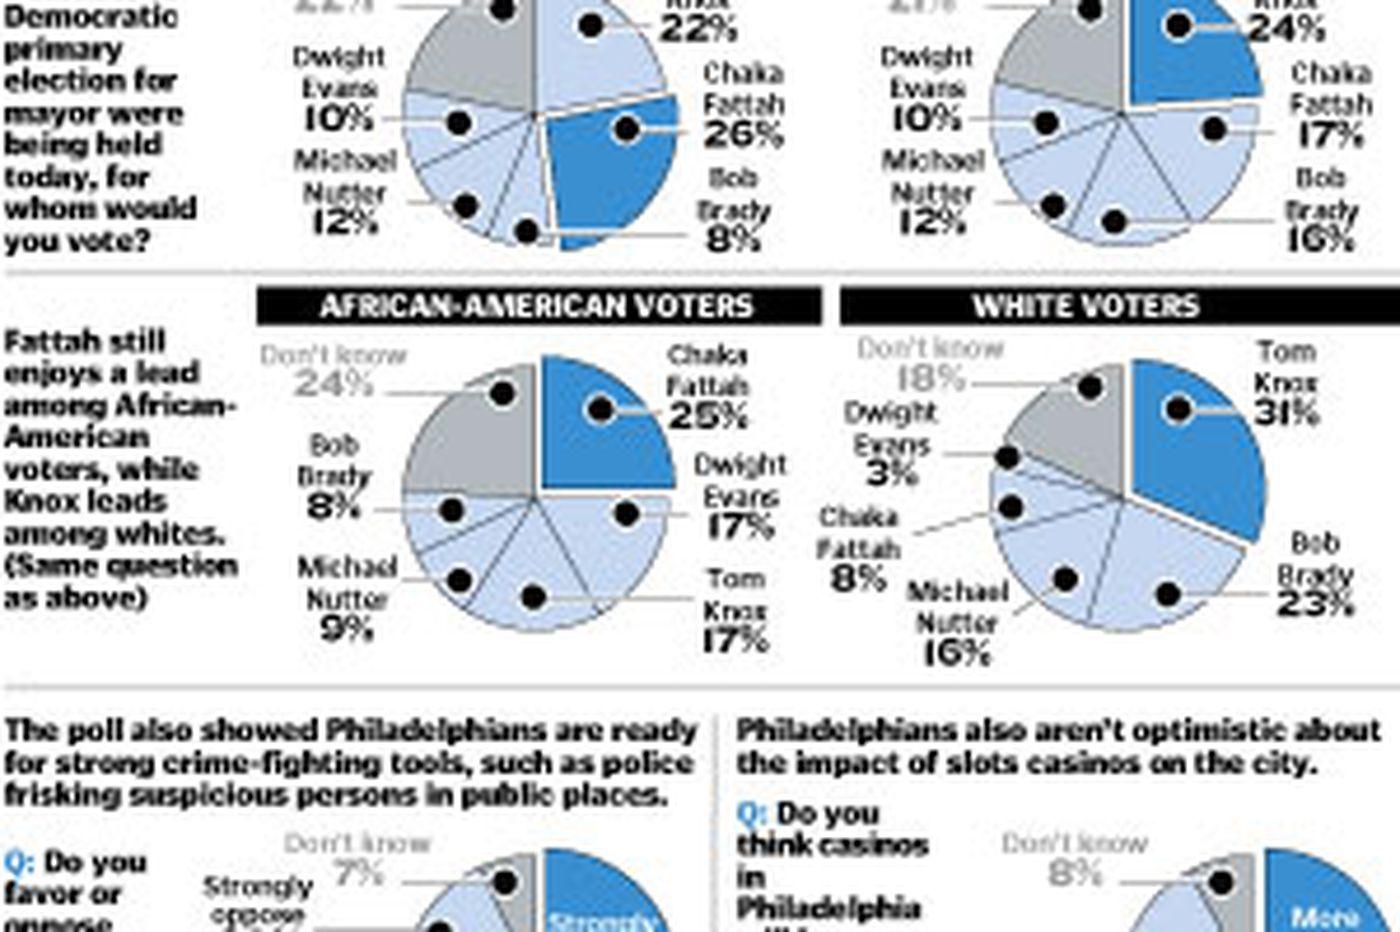 Daily News/Keystone Poll: Brady up, Fattah down, but it's still anybody's race